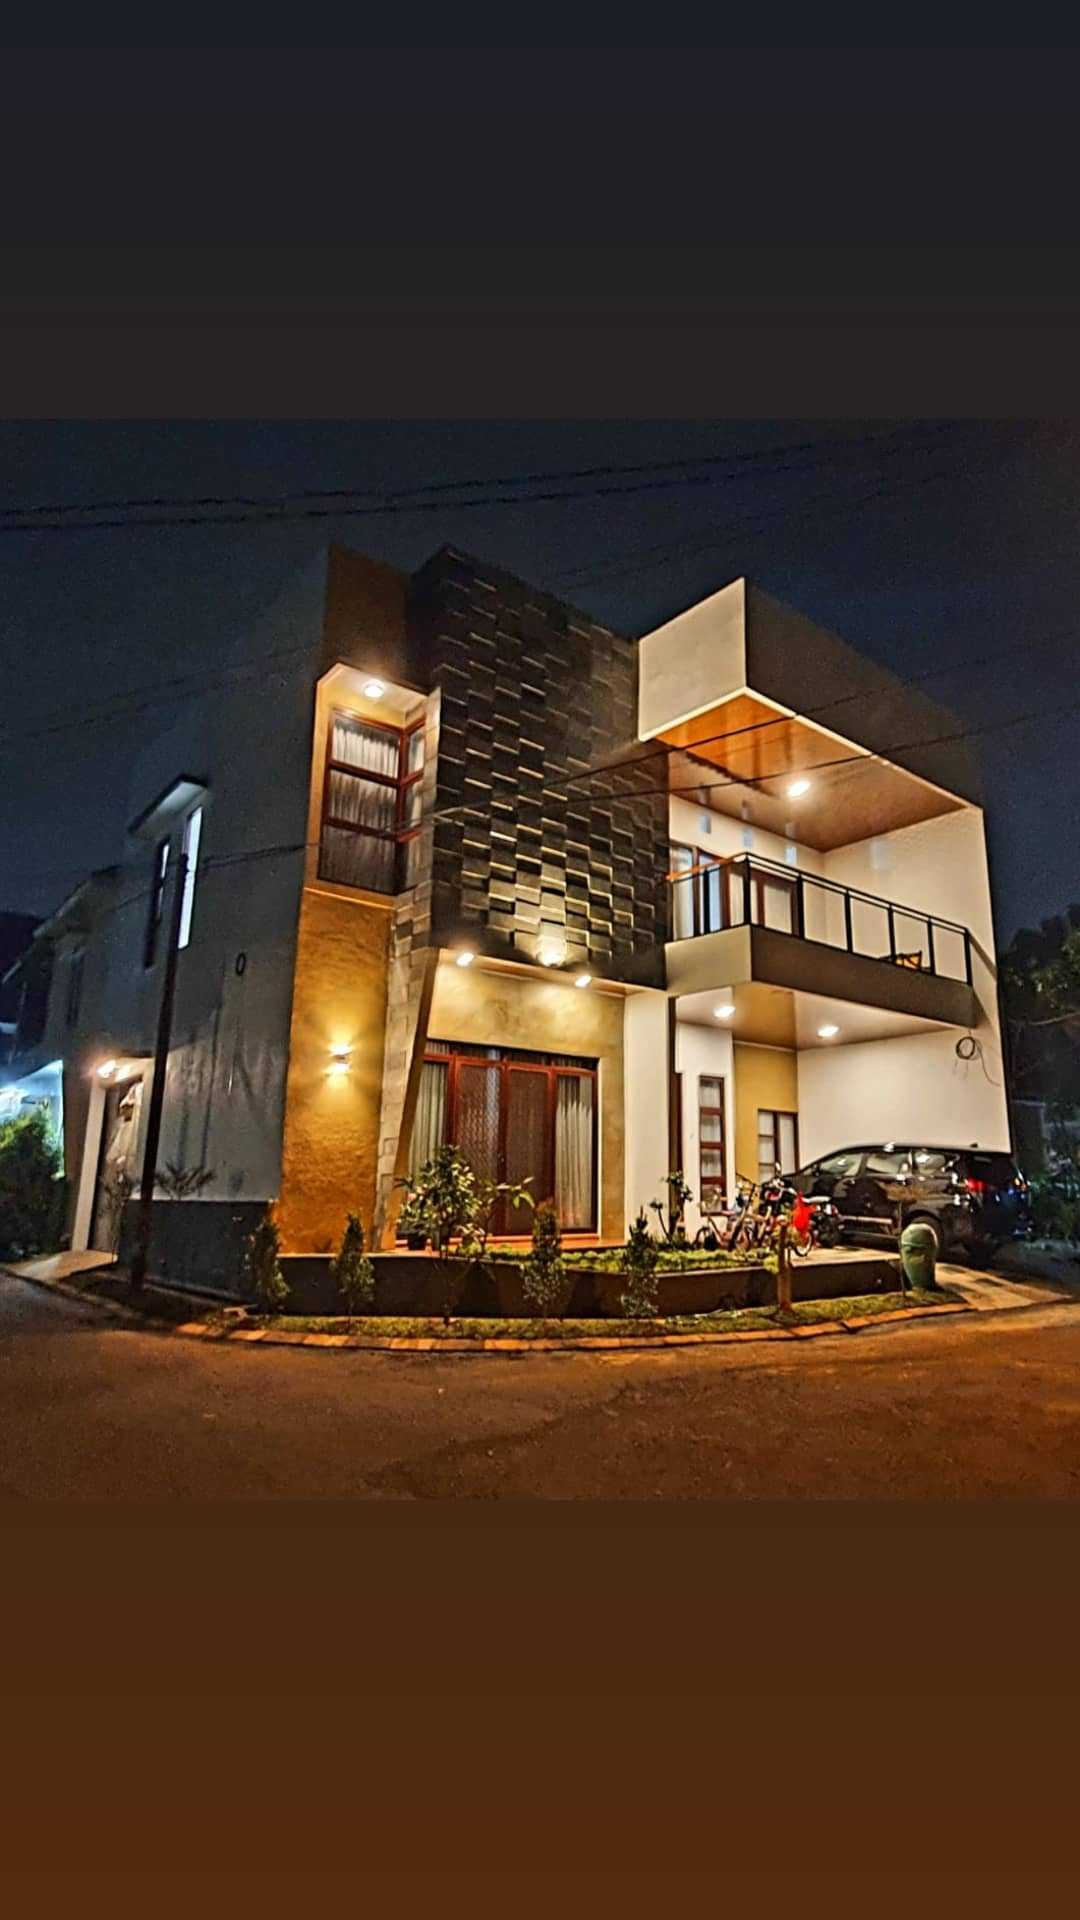 Valian Yoga Ibnu House Depok, Kota Depok, Jawa Barat, Indonesia Depok, Kota Depok, Jawa Barat, Indonesia Valian-Yoga-Ibnu-House   128576